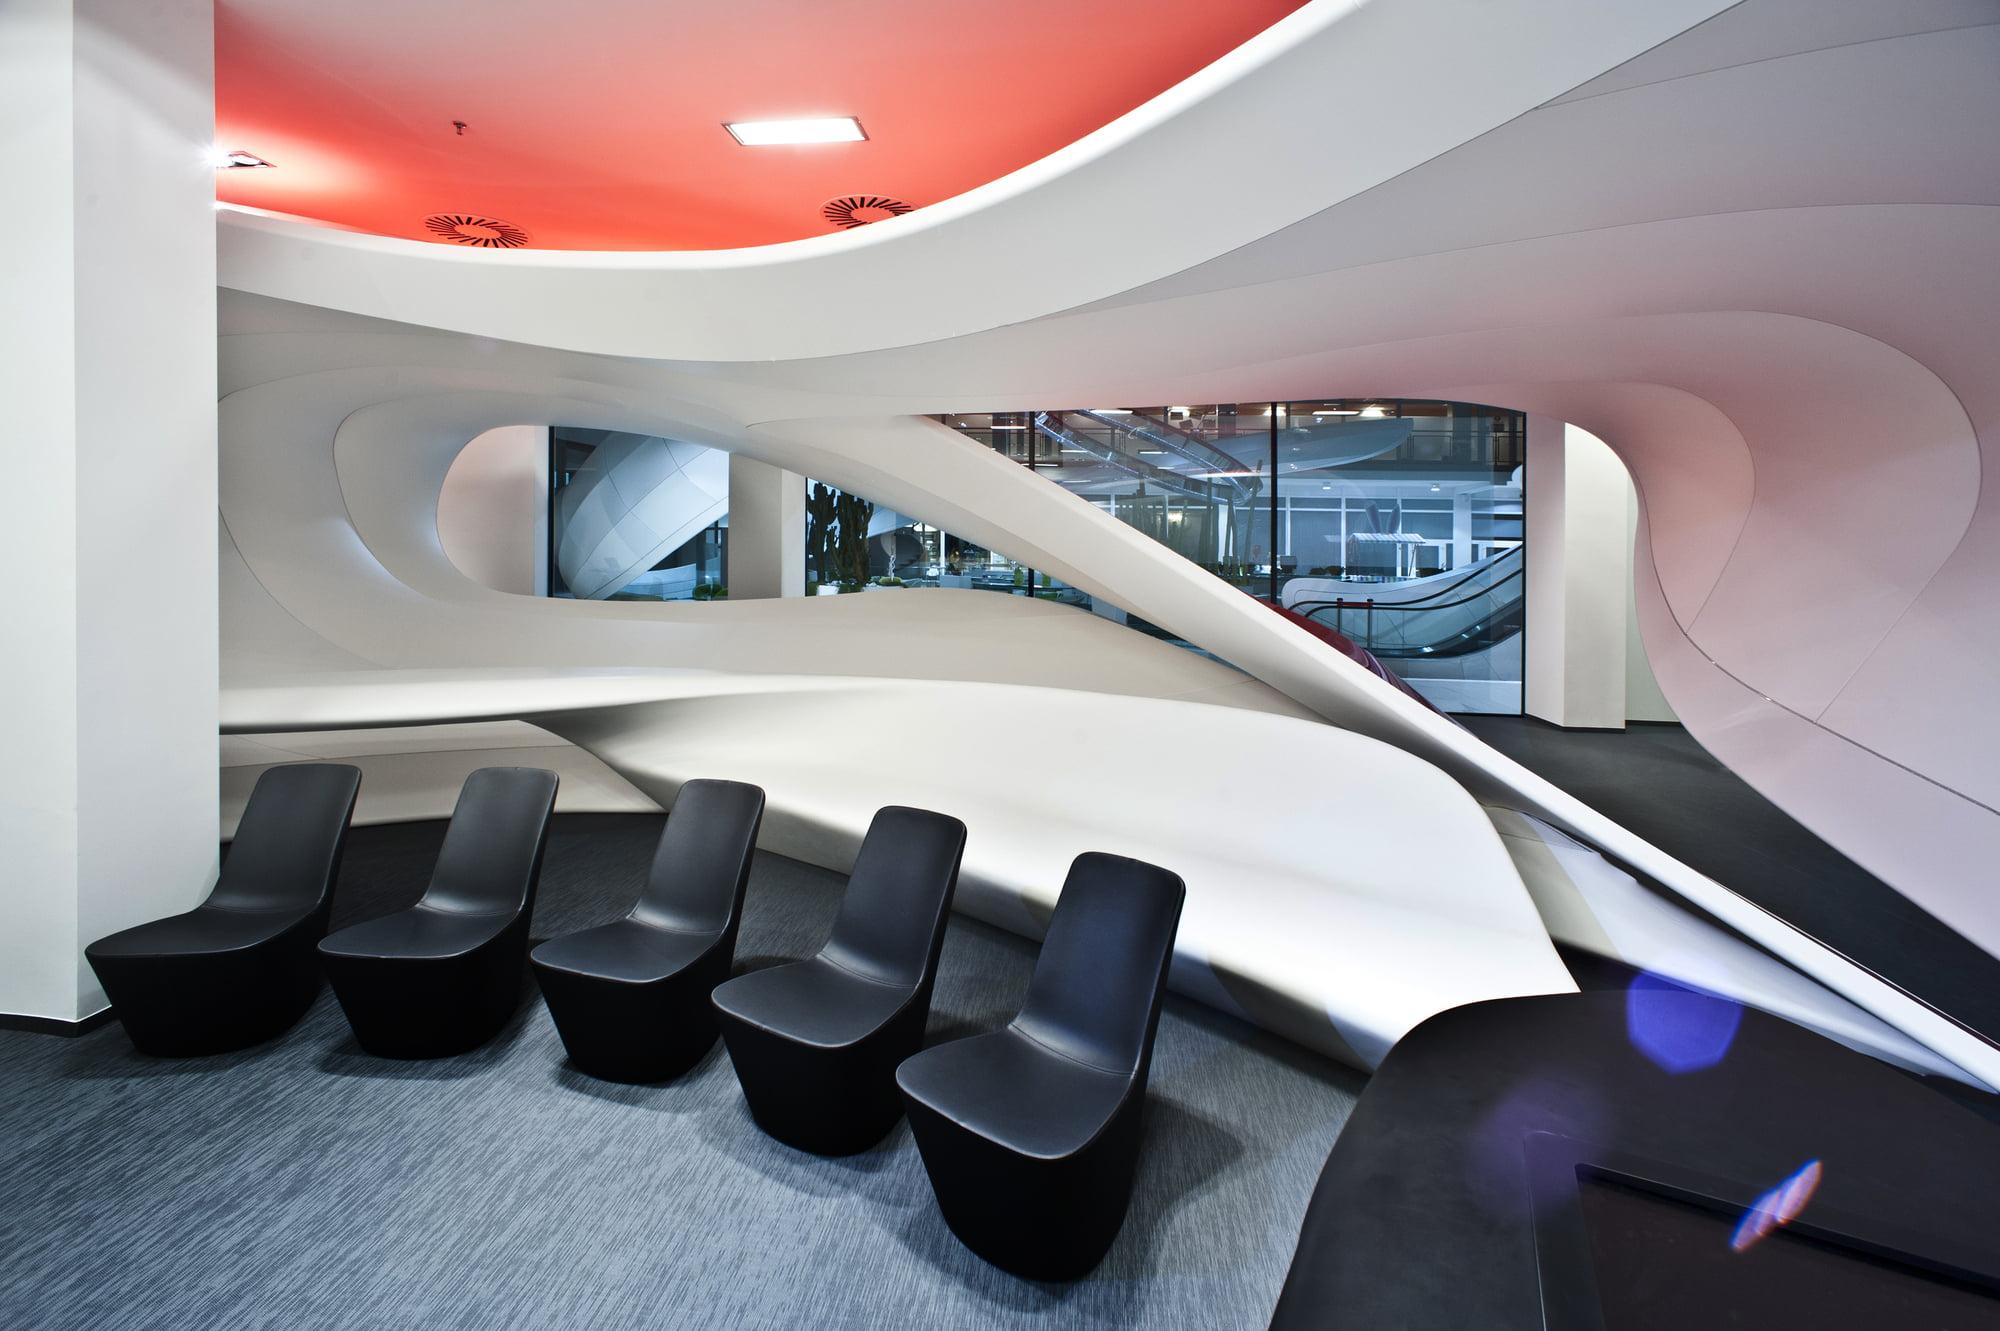 Vodafone customer experience center interior design for Interior design work experience